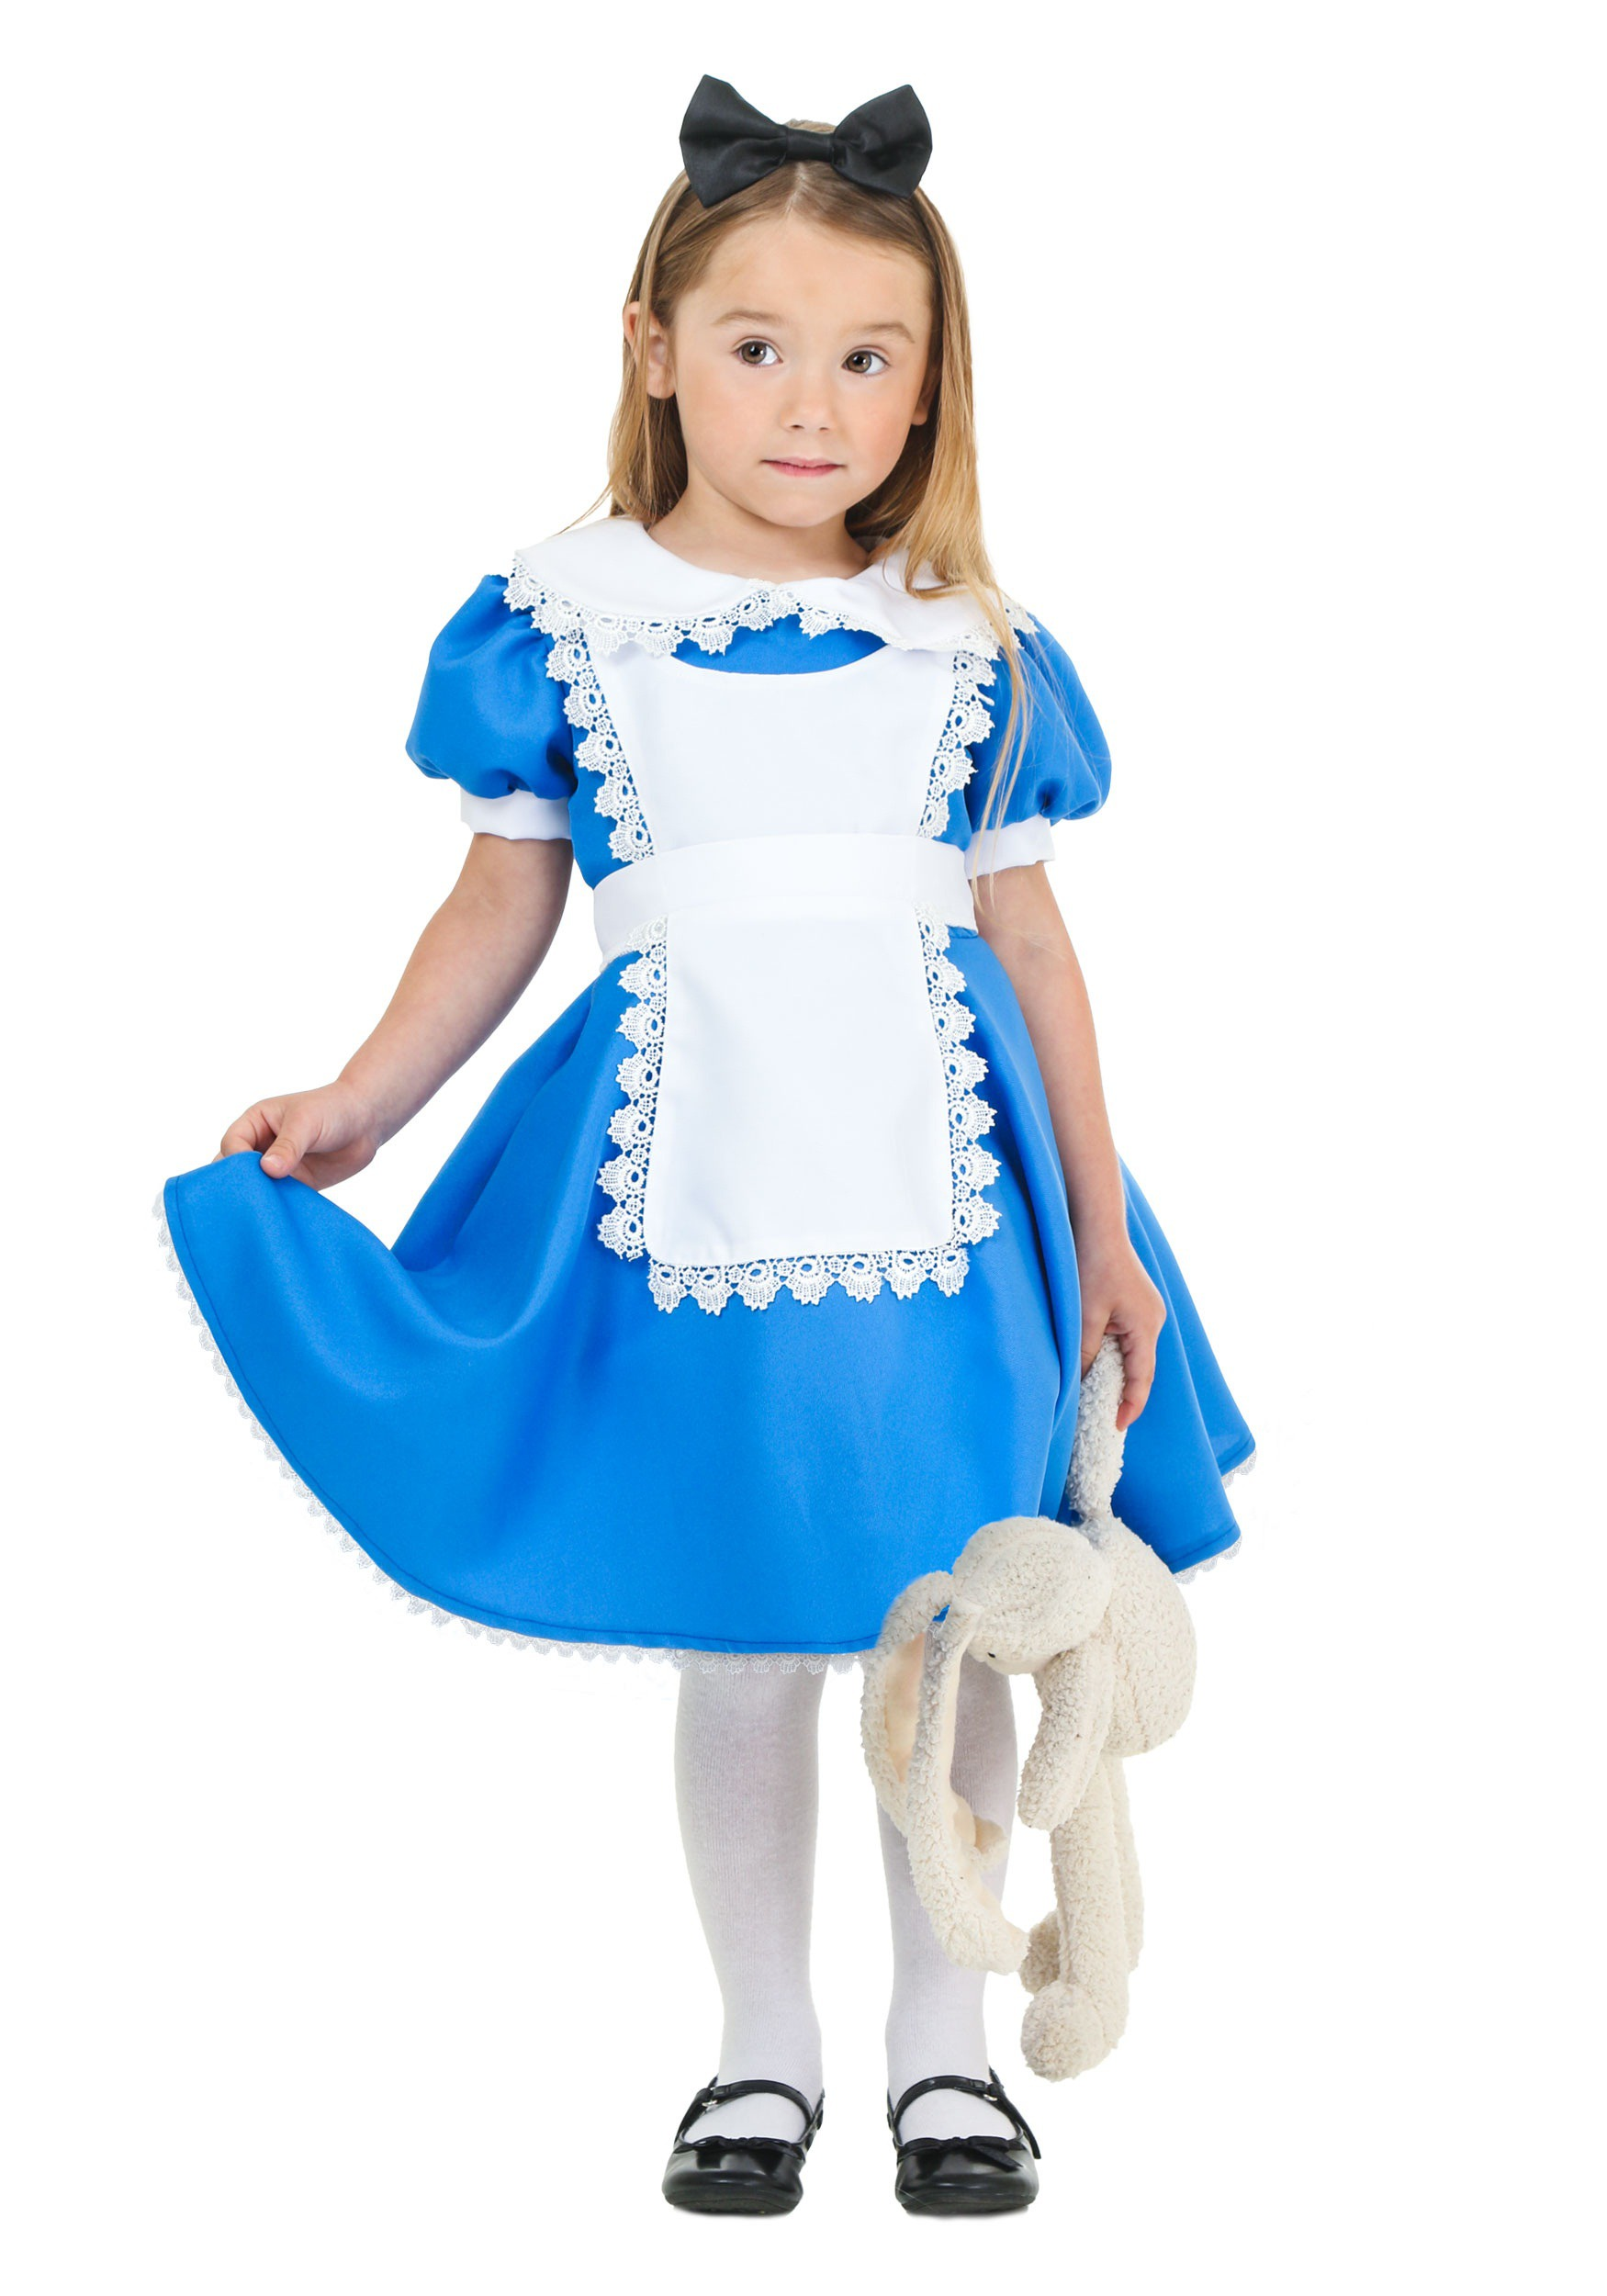 Toddler Halloween Costumes - HalloweenCostumes.com